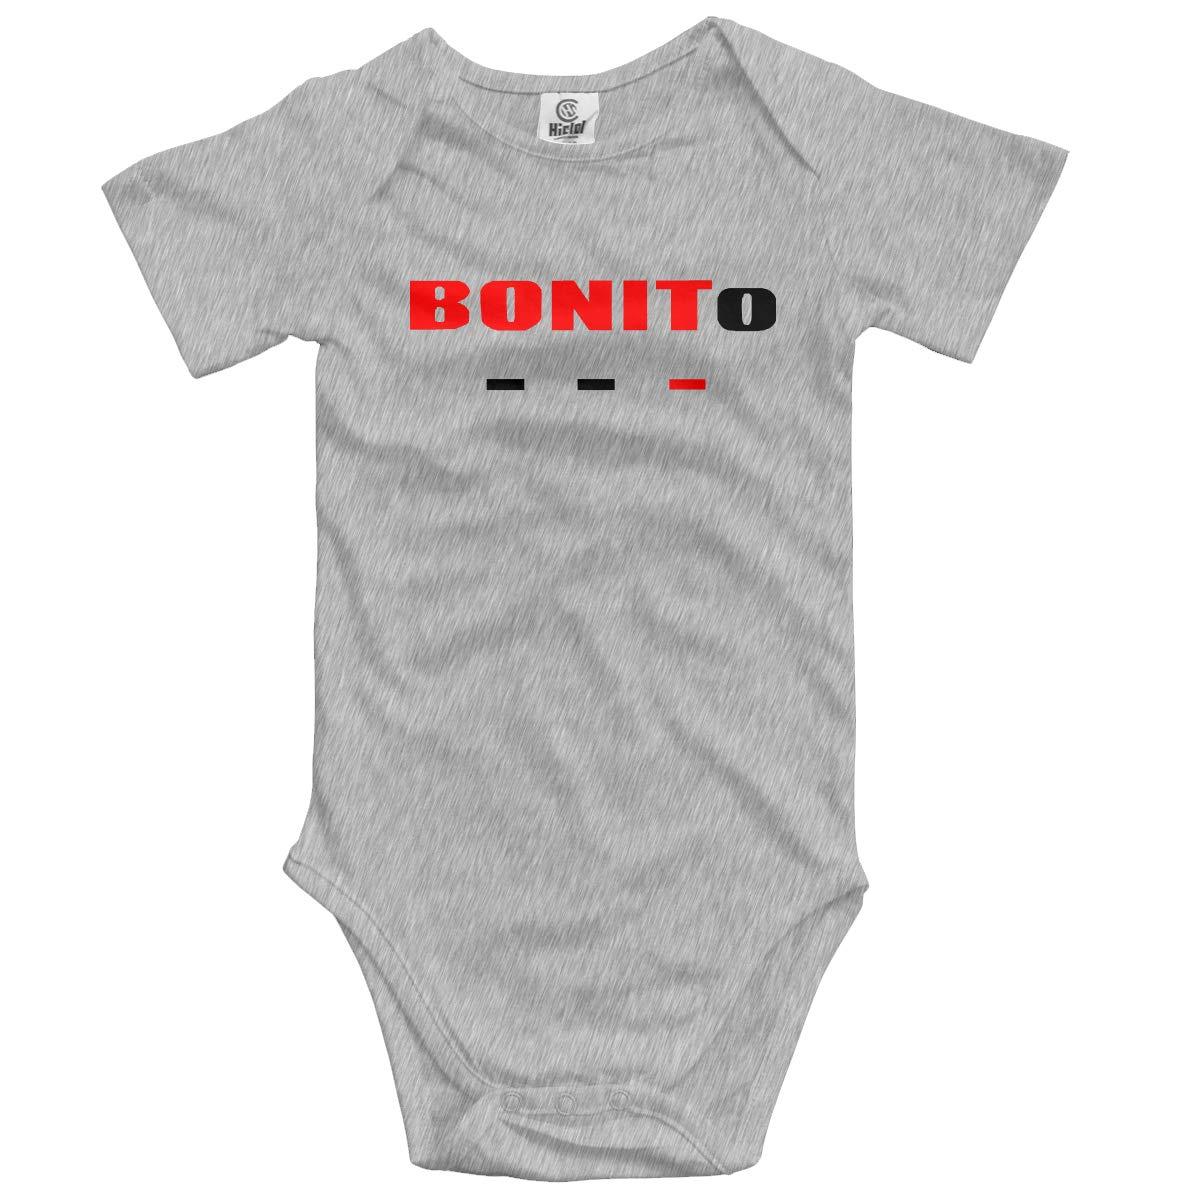 VANMASS Babys Bonito Short Sleeve Bodysuit Clothes Baby Playsuit